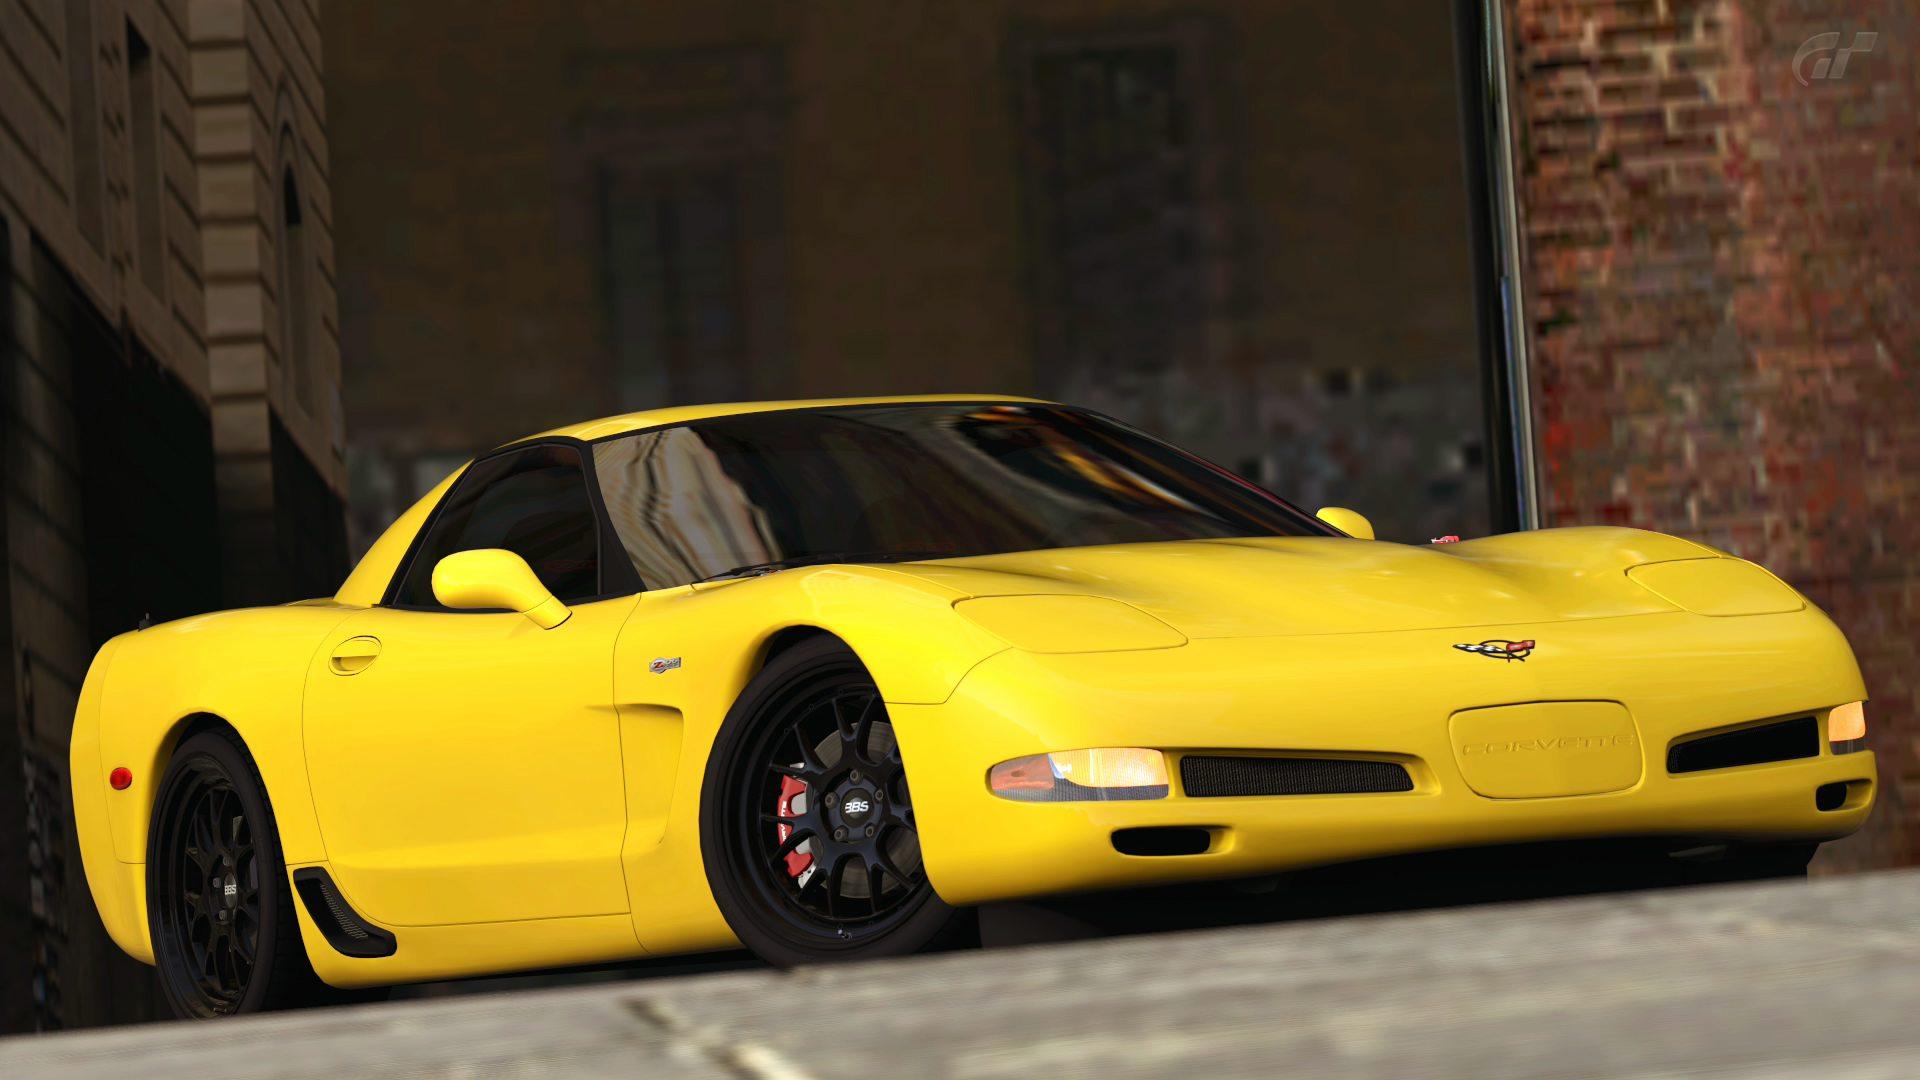 The 1997 2004 C5 Corvette Buyers Guide Corvsport Com